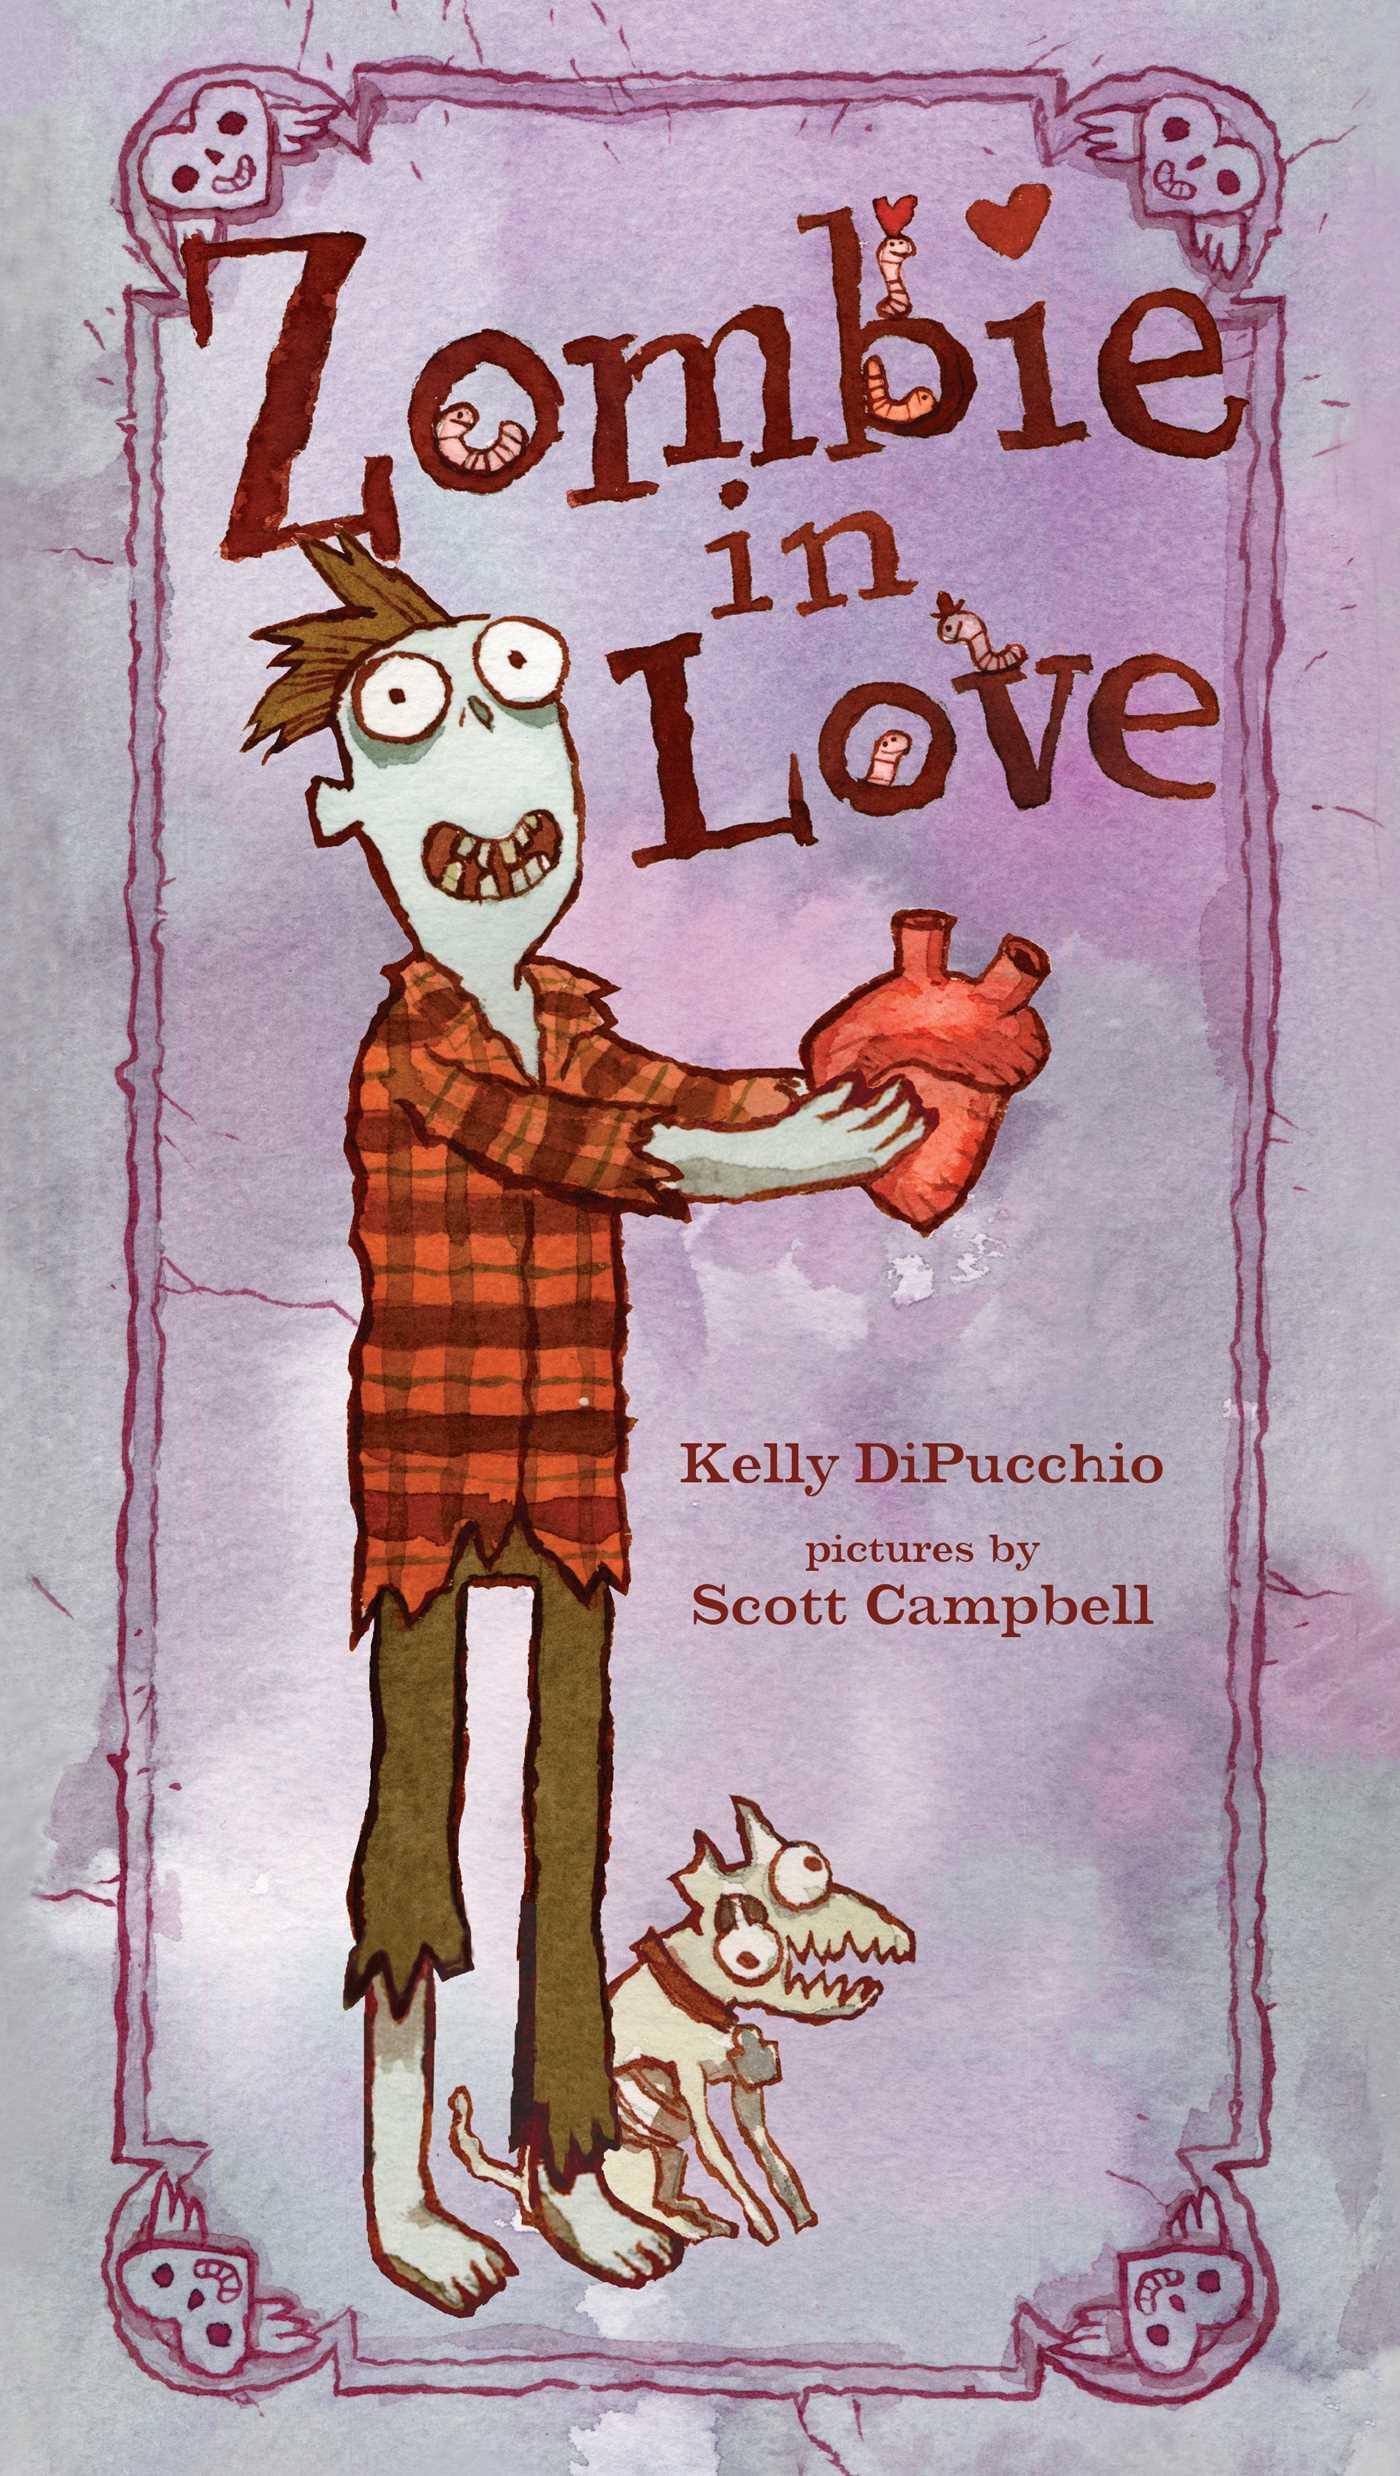 Zombie in love enhanced ebook edition 9781442451377 hr